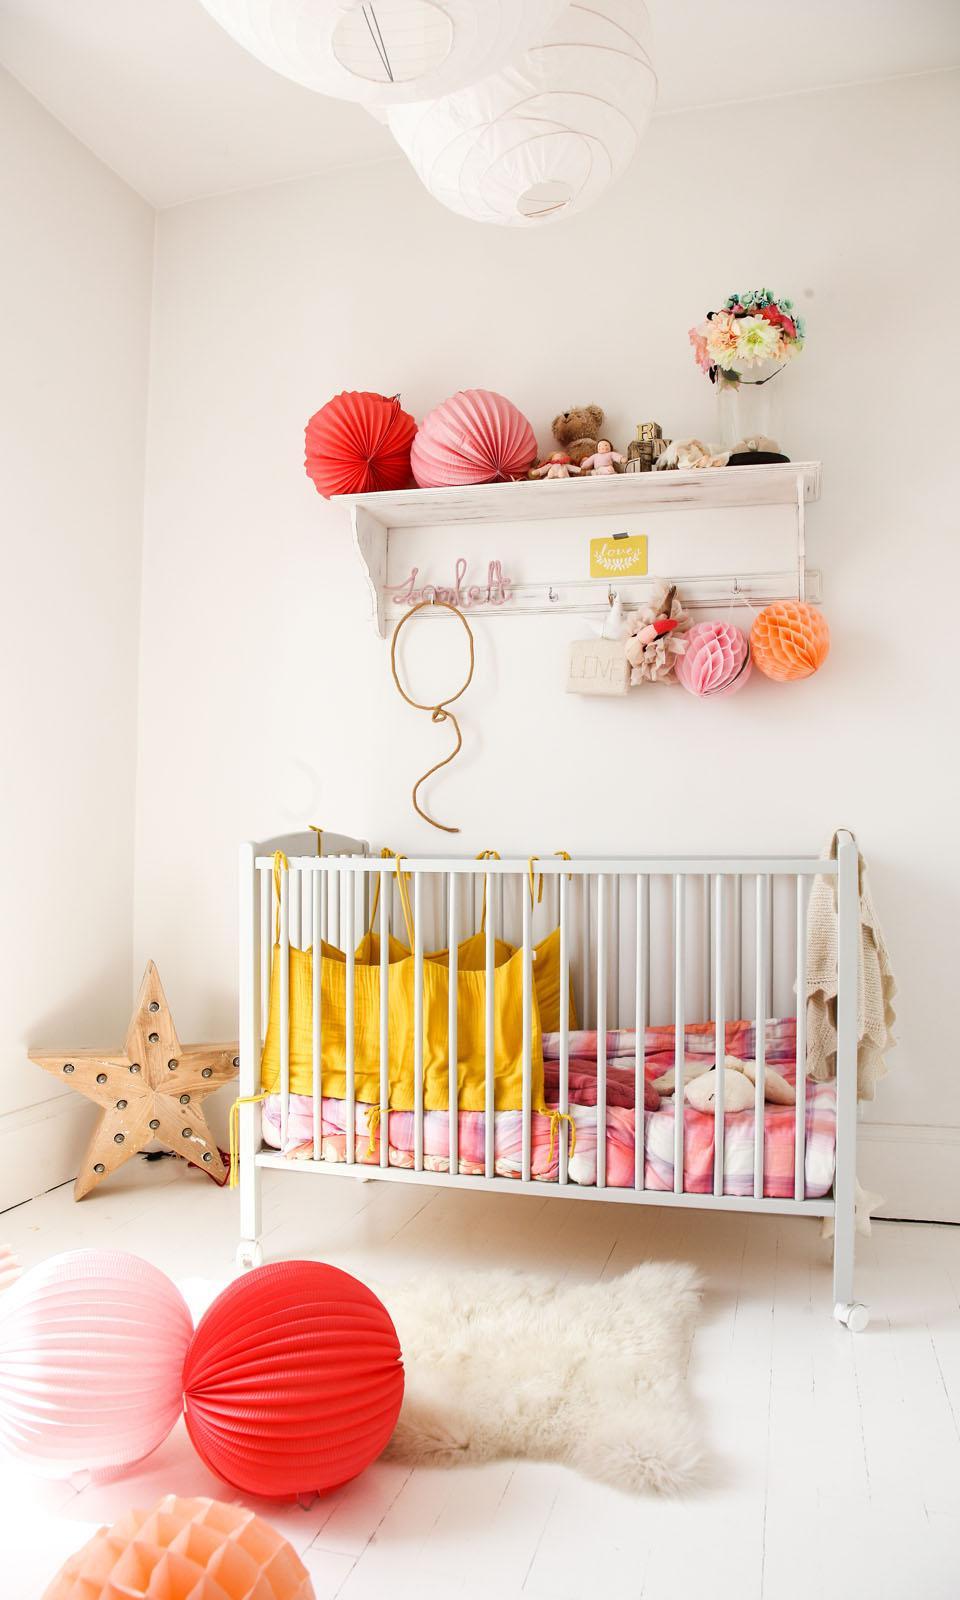 Child's Bedroom of Scarlett, 18 months #8